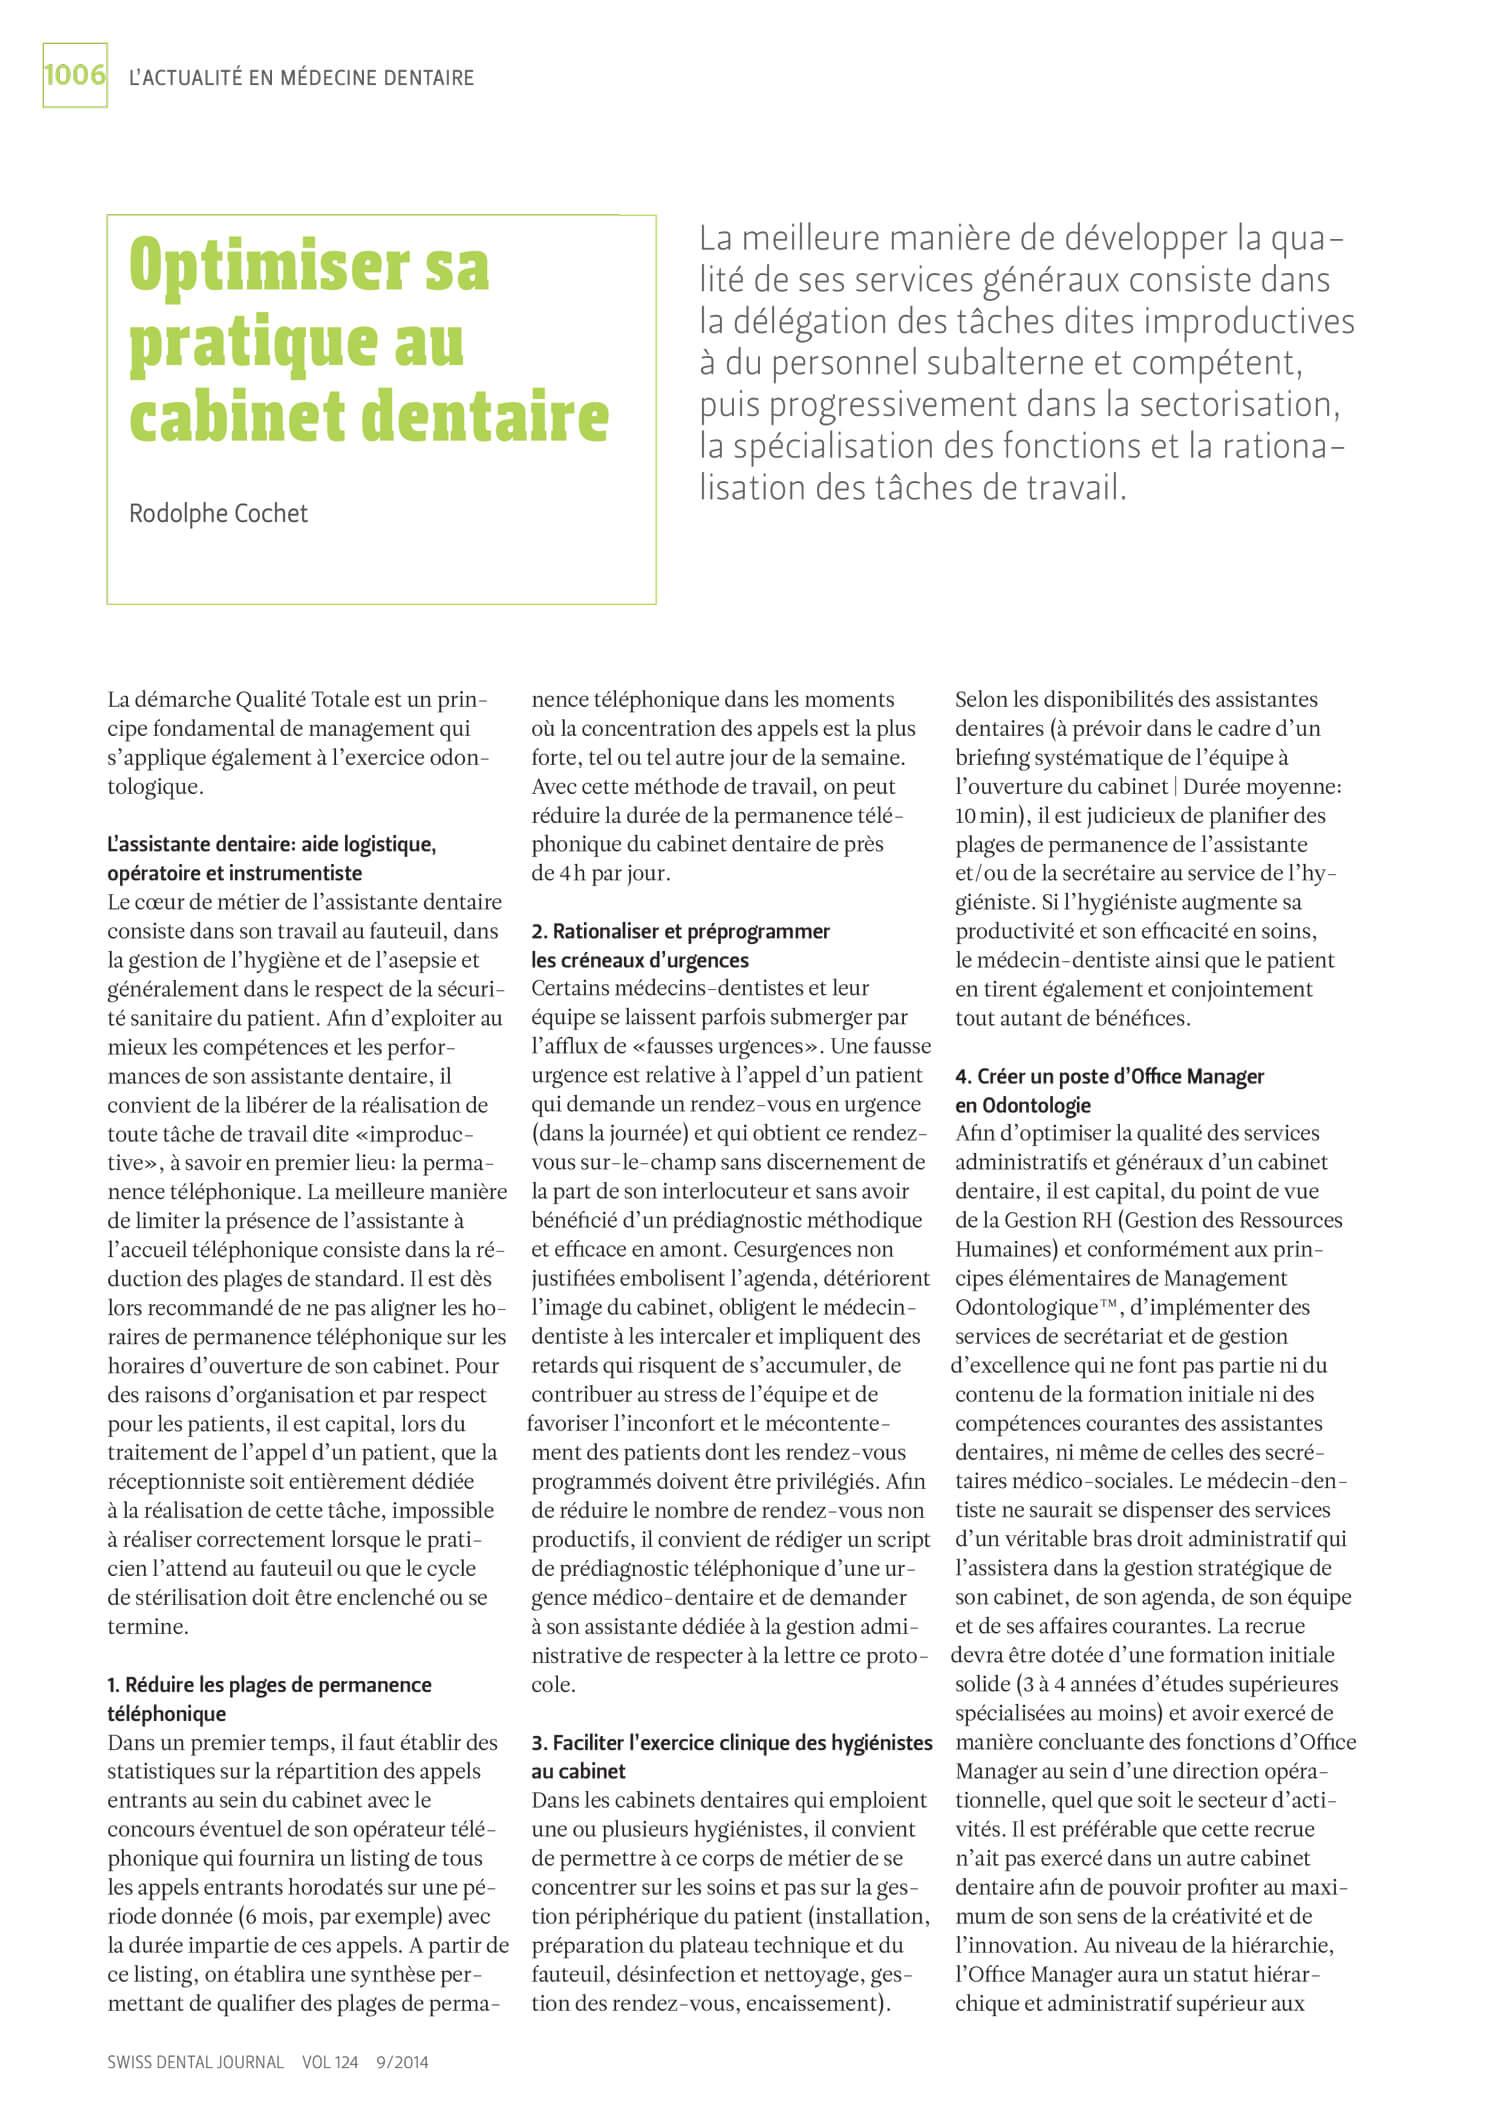 optimiser-pratique-cabinet-dentaire-management-gestion-rodolphe-cochet.jpg